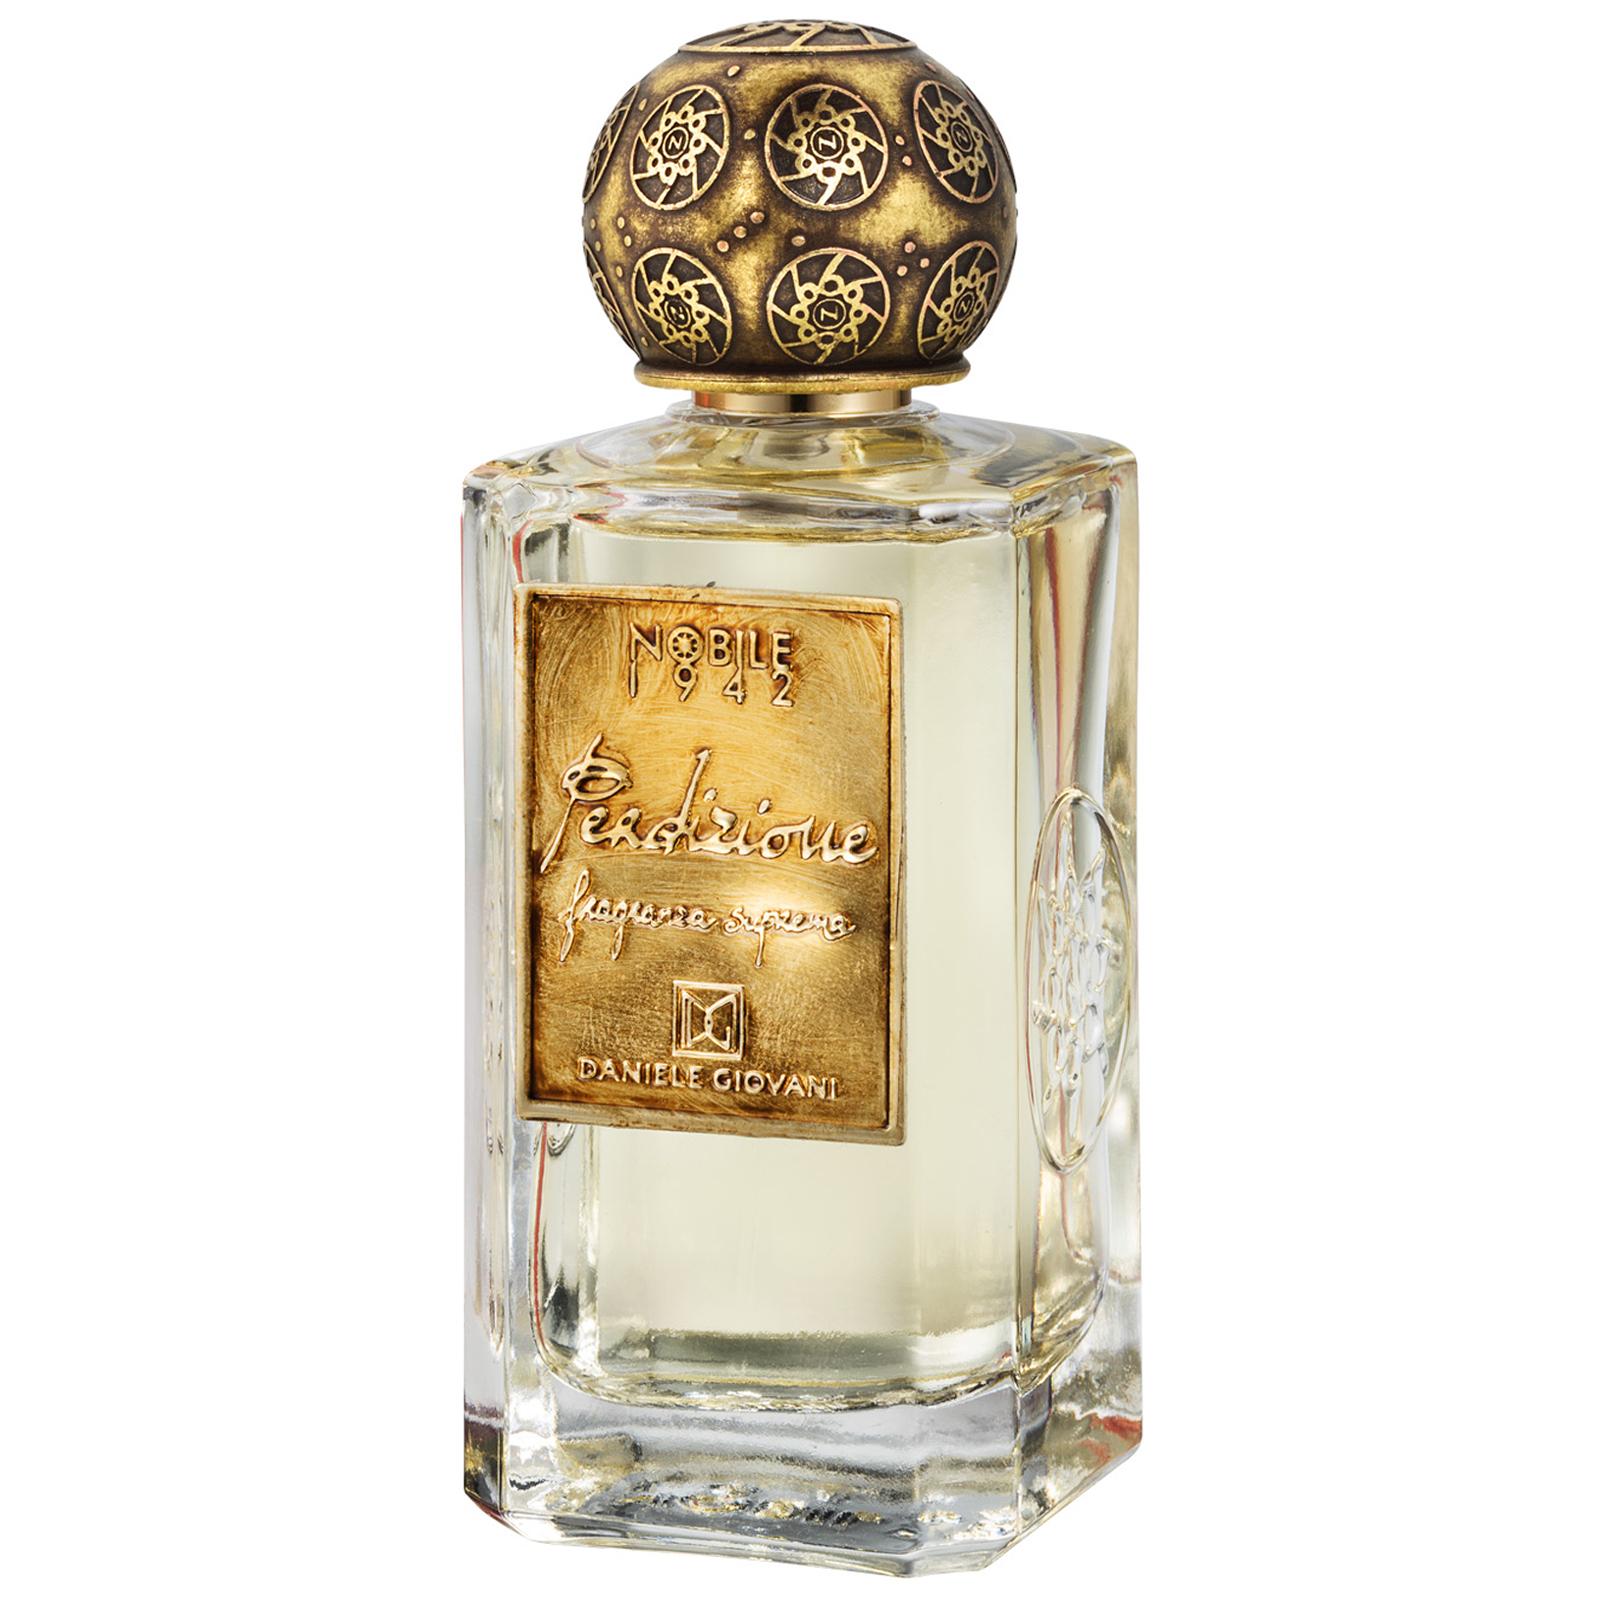 Perdizione profumo eau de parfum 75 ml